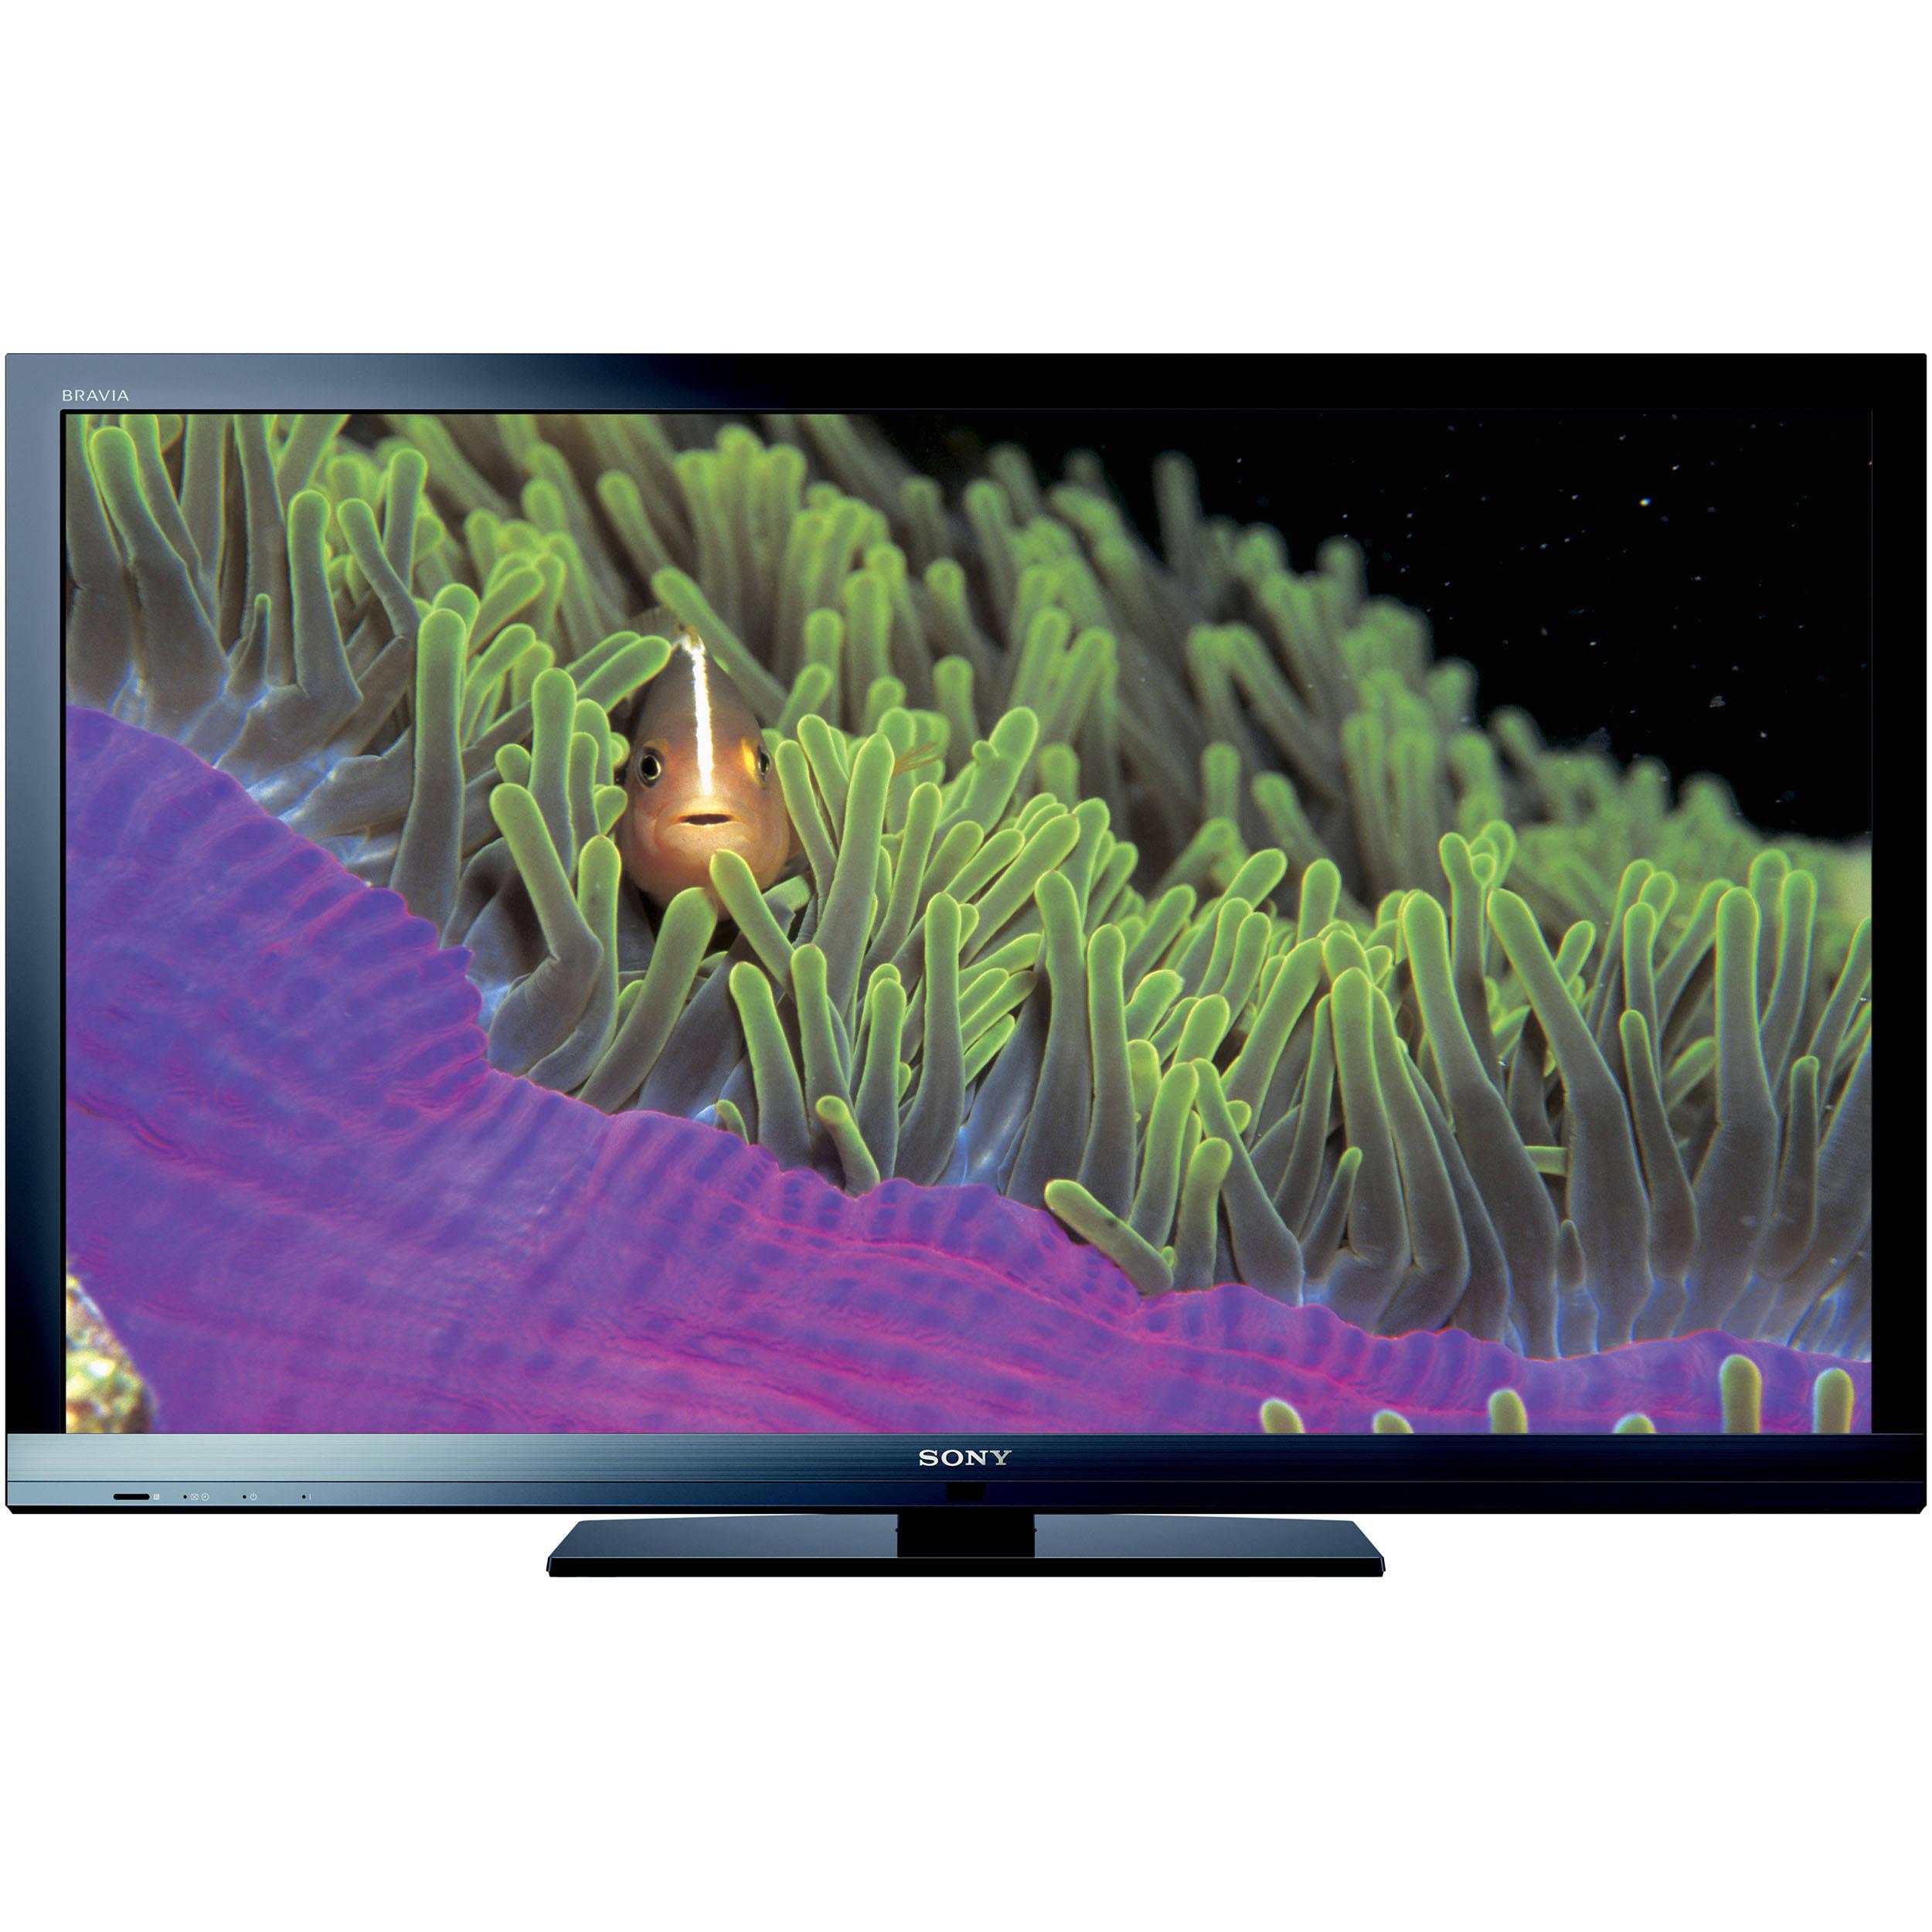 Sony KDL-46EX710 BRAVIA HDTV Windows 8 X64